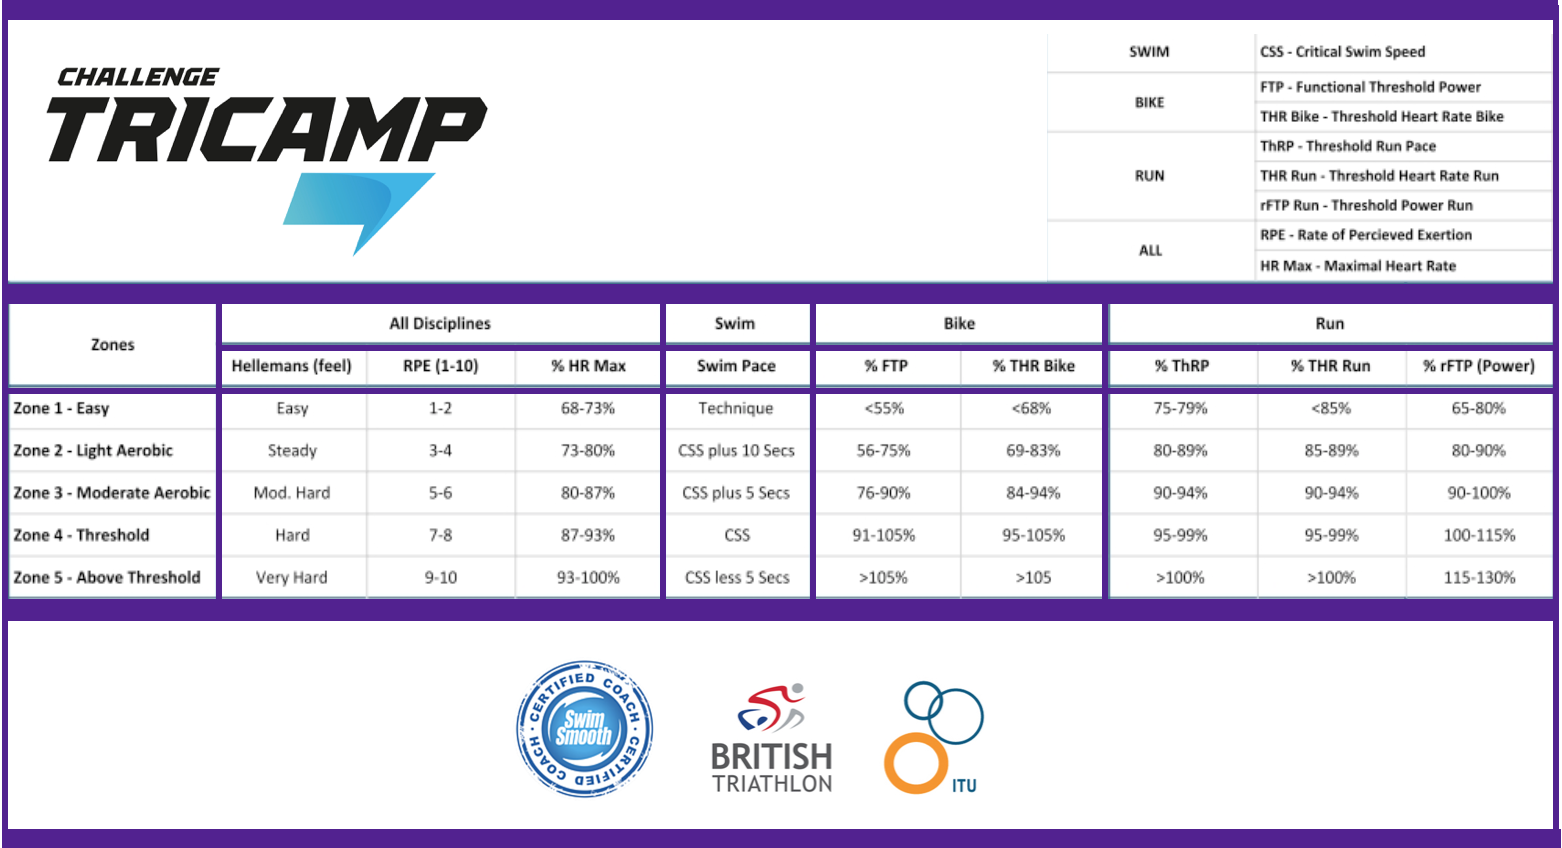 Challenge Tri Camp Zones, RPE & Terminology